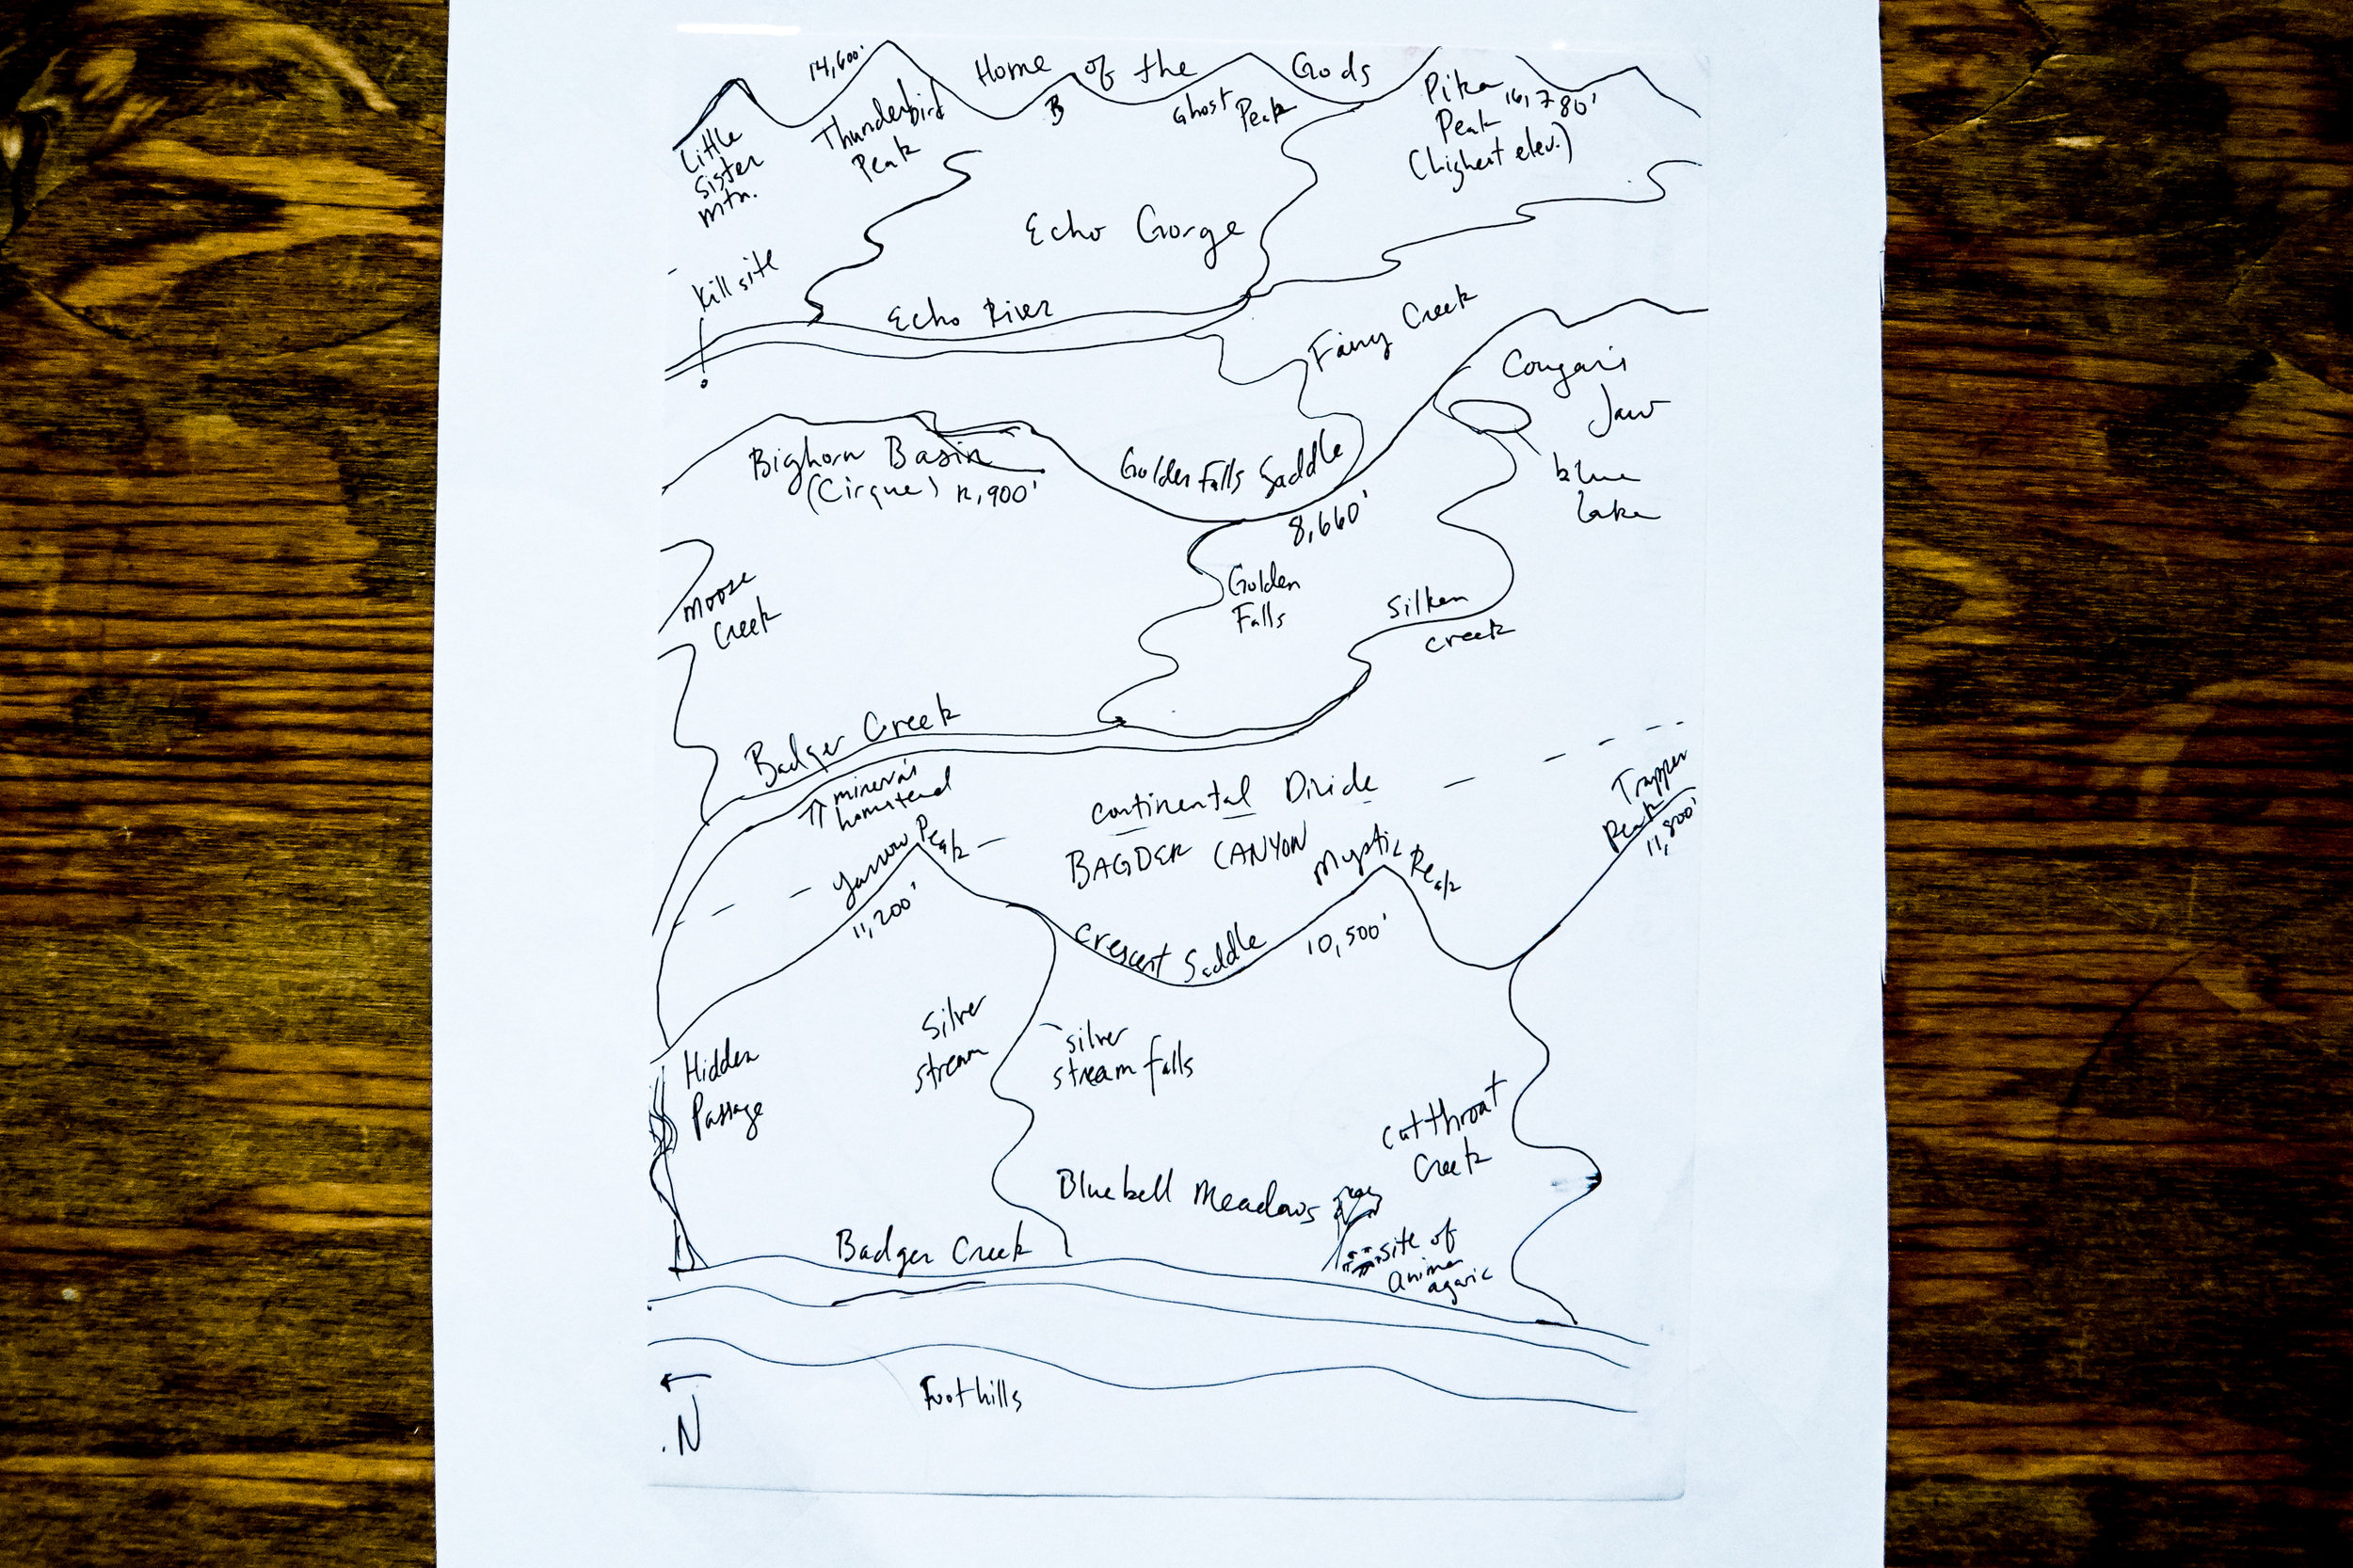 Crazy mtn map rough draft.jpg